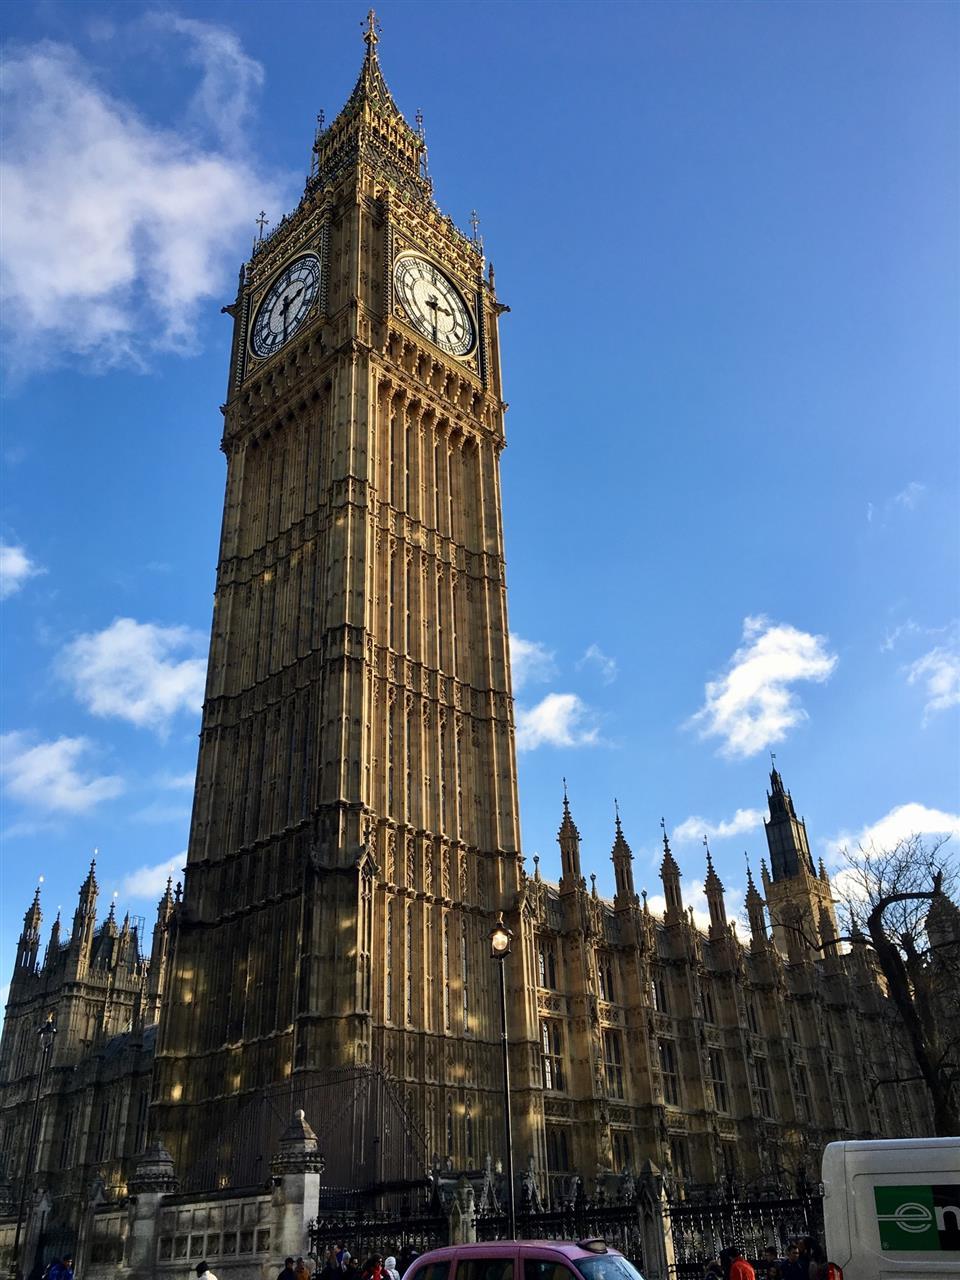 #leadingRElocal #BigBen #London